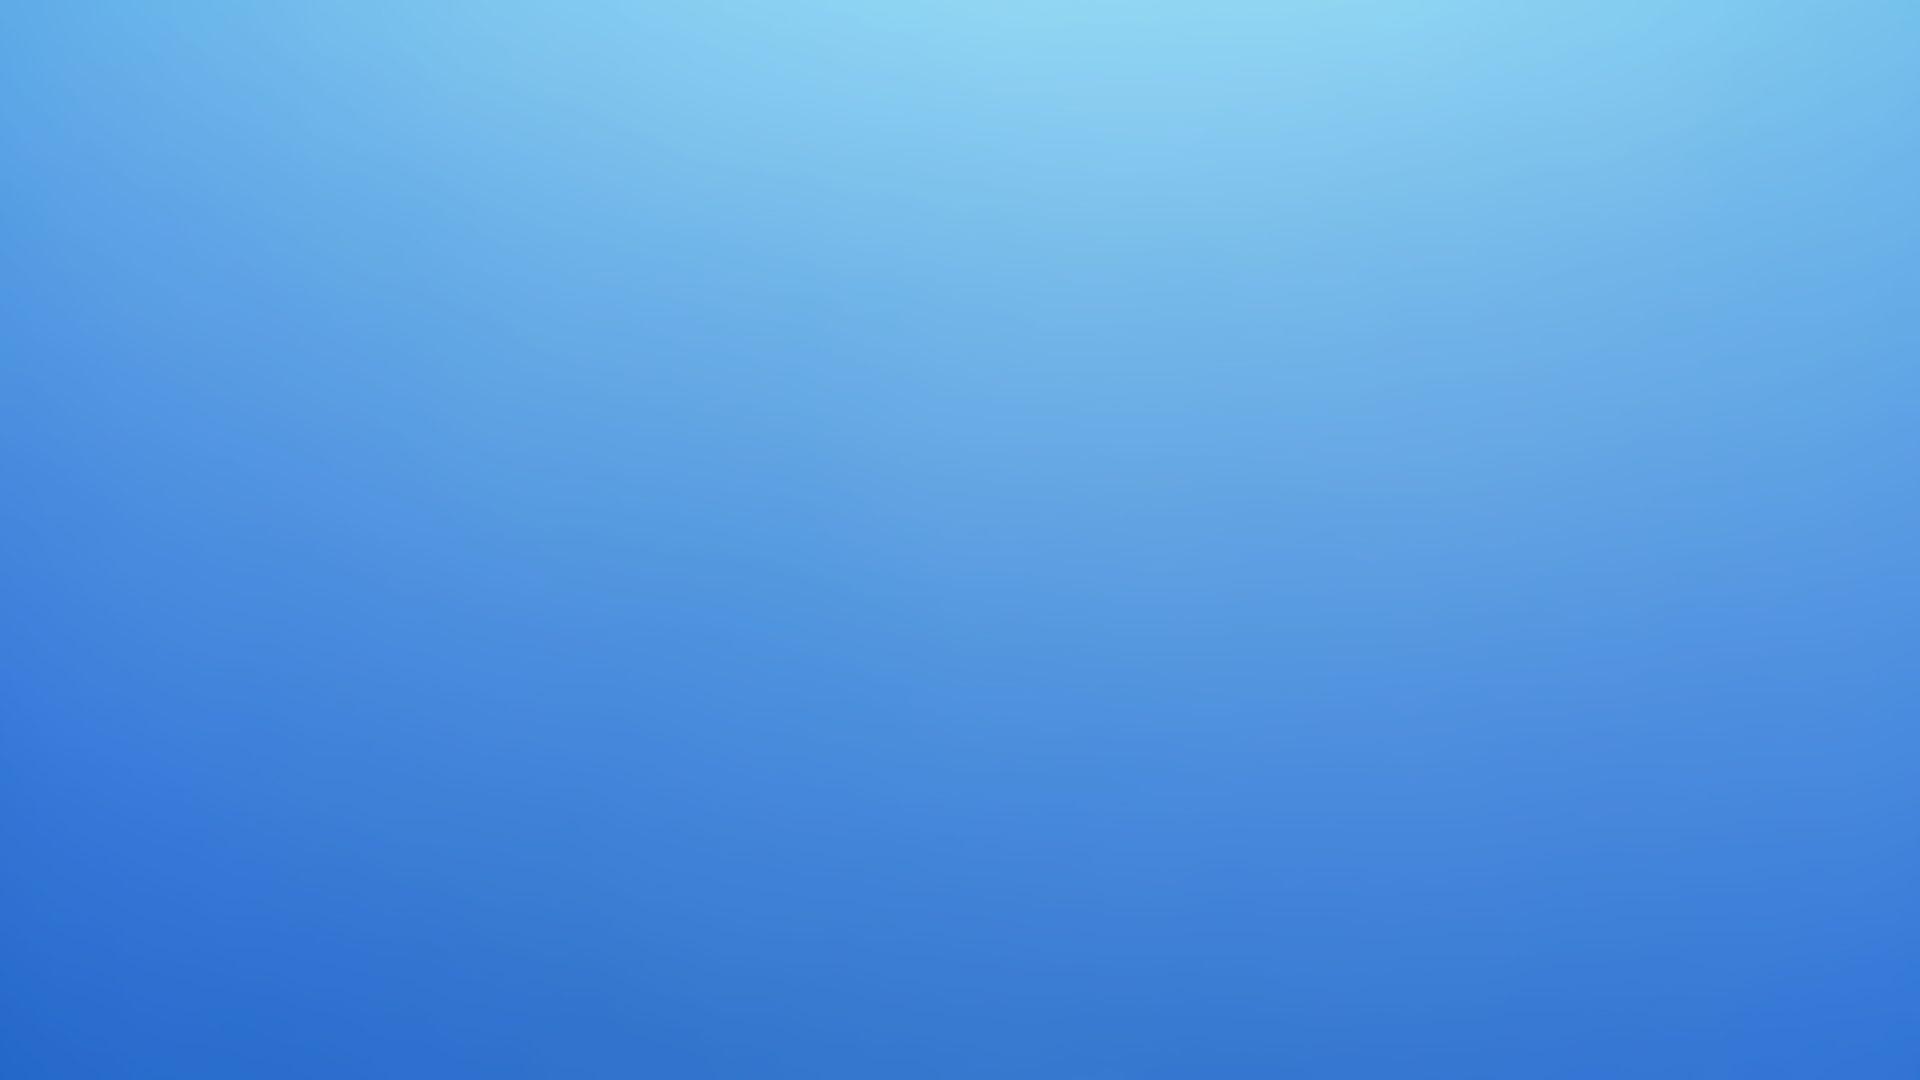 Sky Blue Wallpapers - Wallpaper Cave